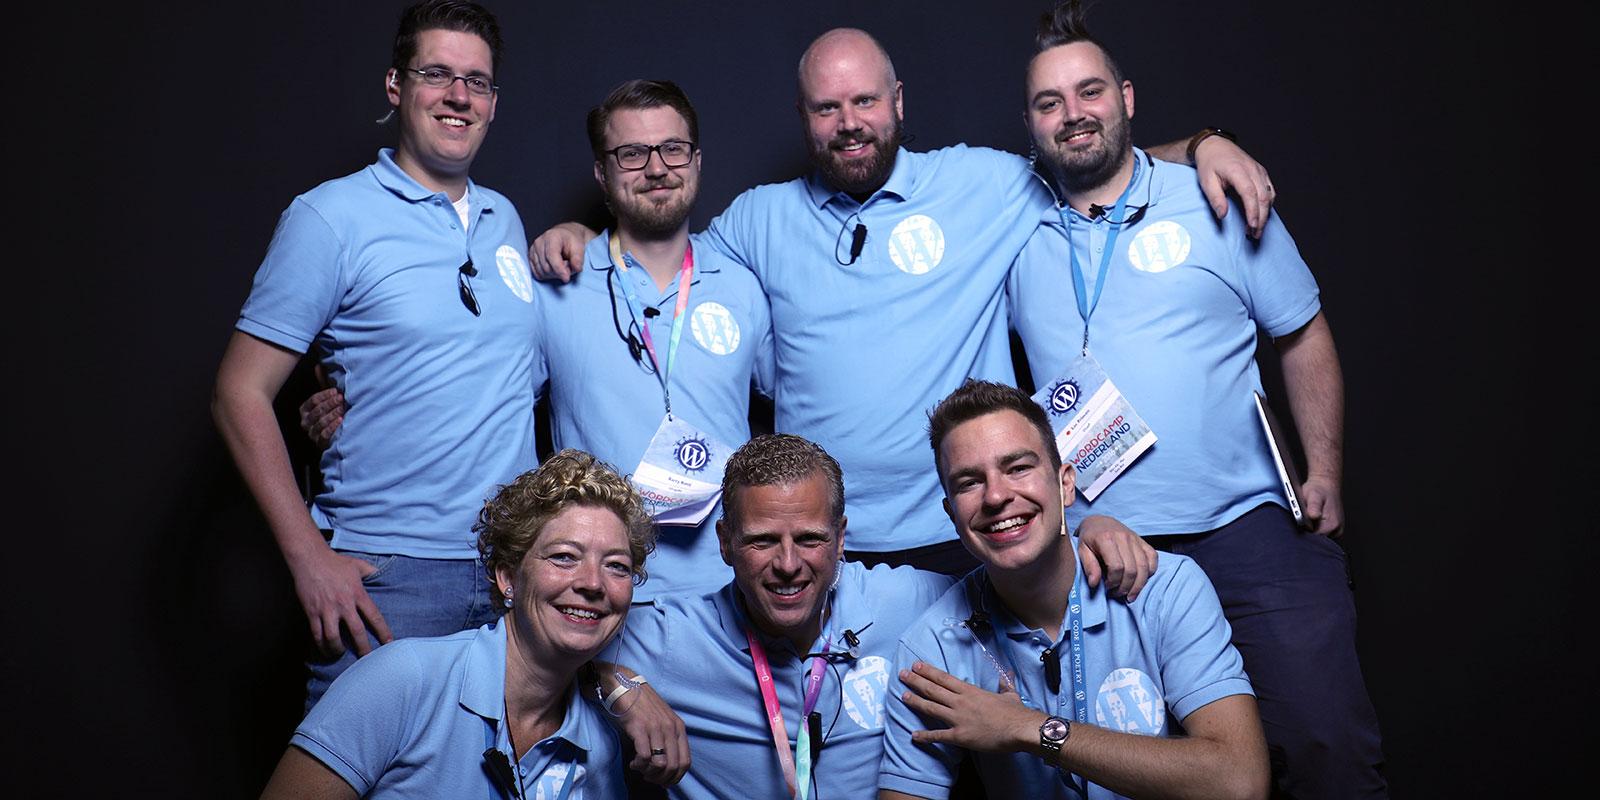 Organisatie WordCamp Nederland 2016. V.l.n.r. Taco, Wendy, Barry, Marcel, Remkus, Bas en Luc. Foto door Henk-Jan Winkeldermaat